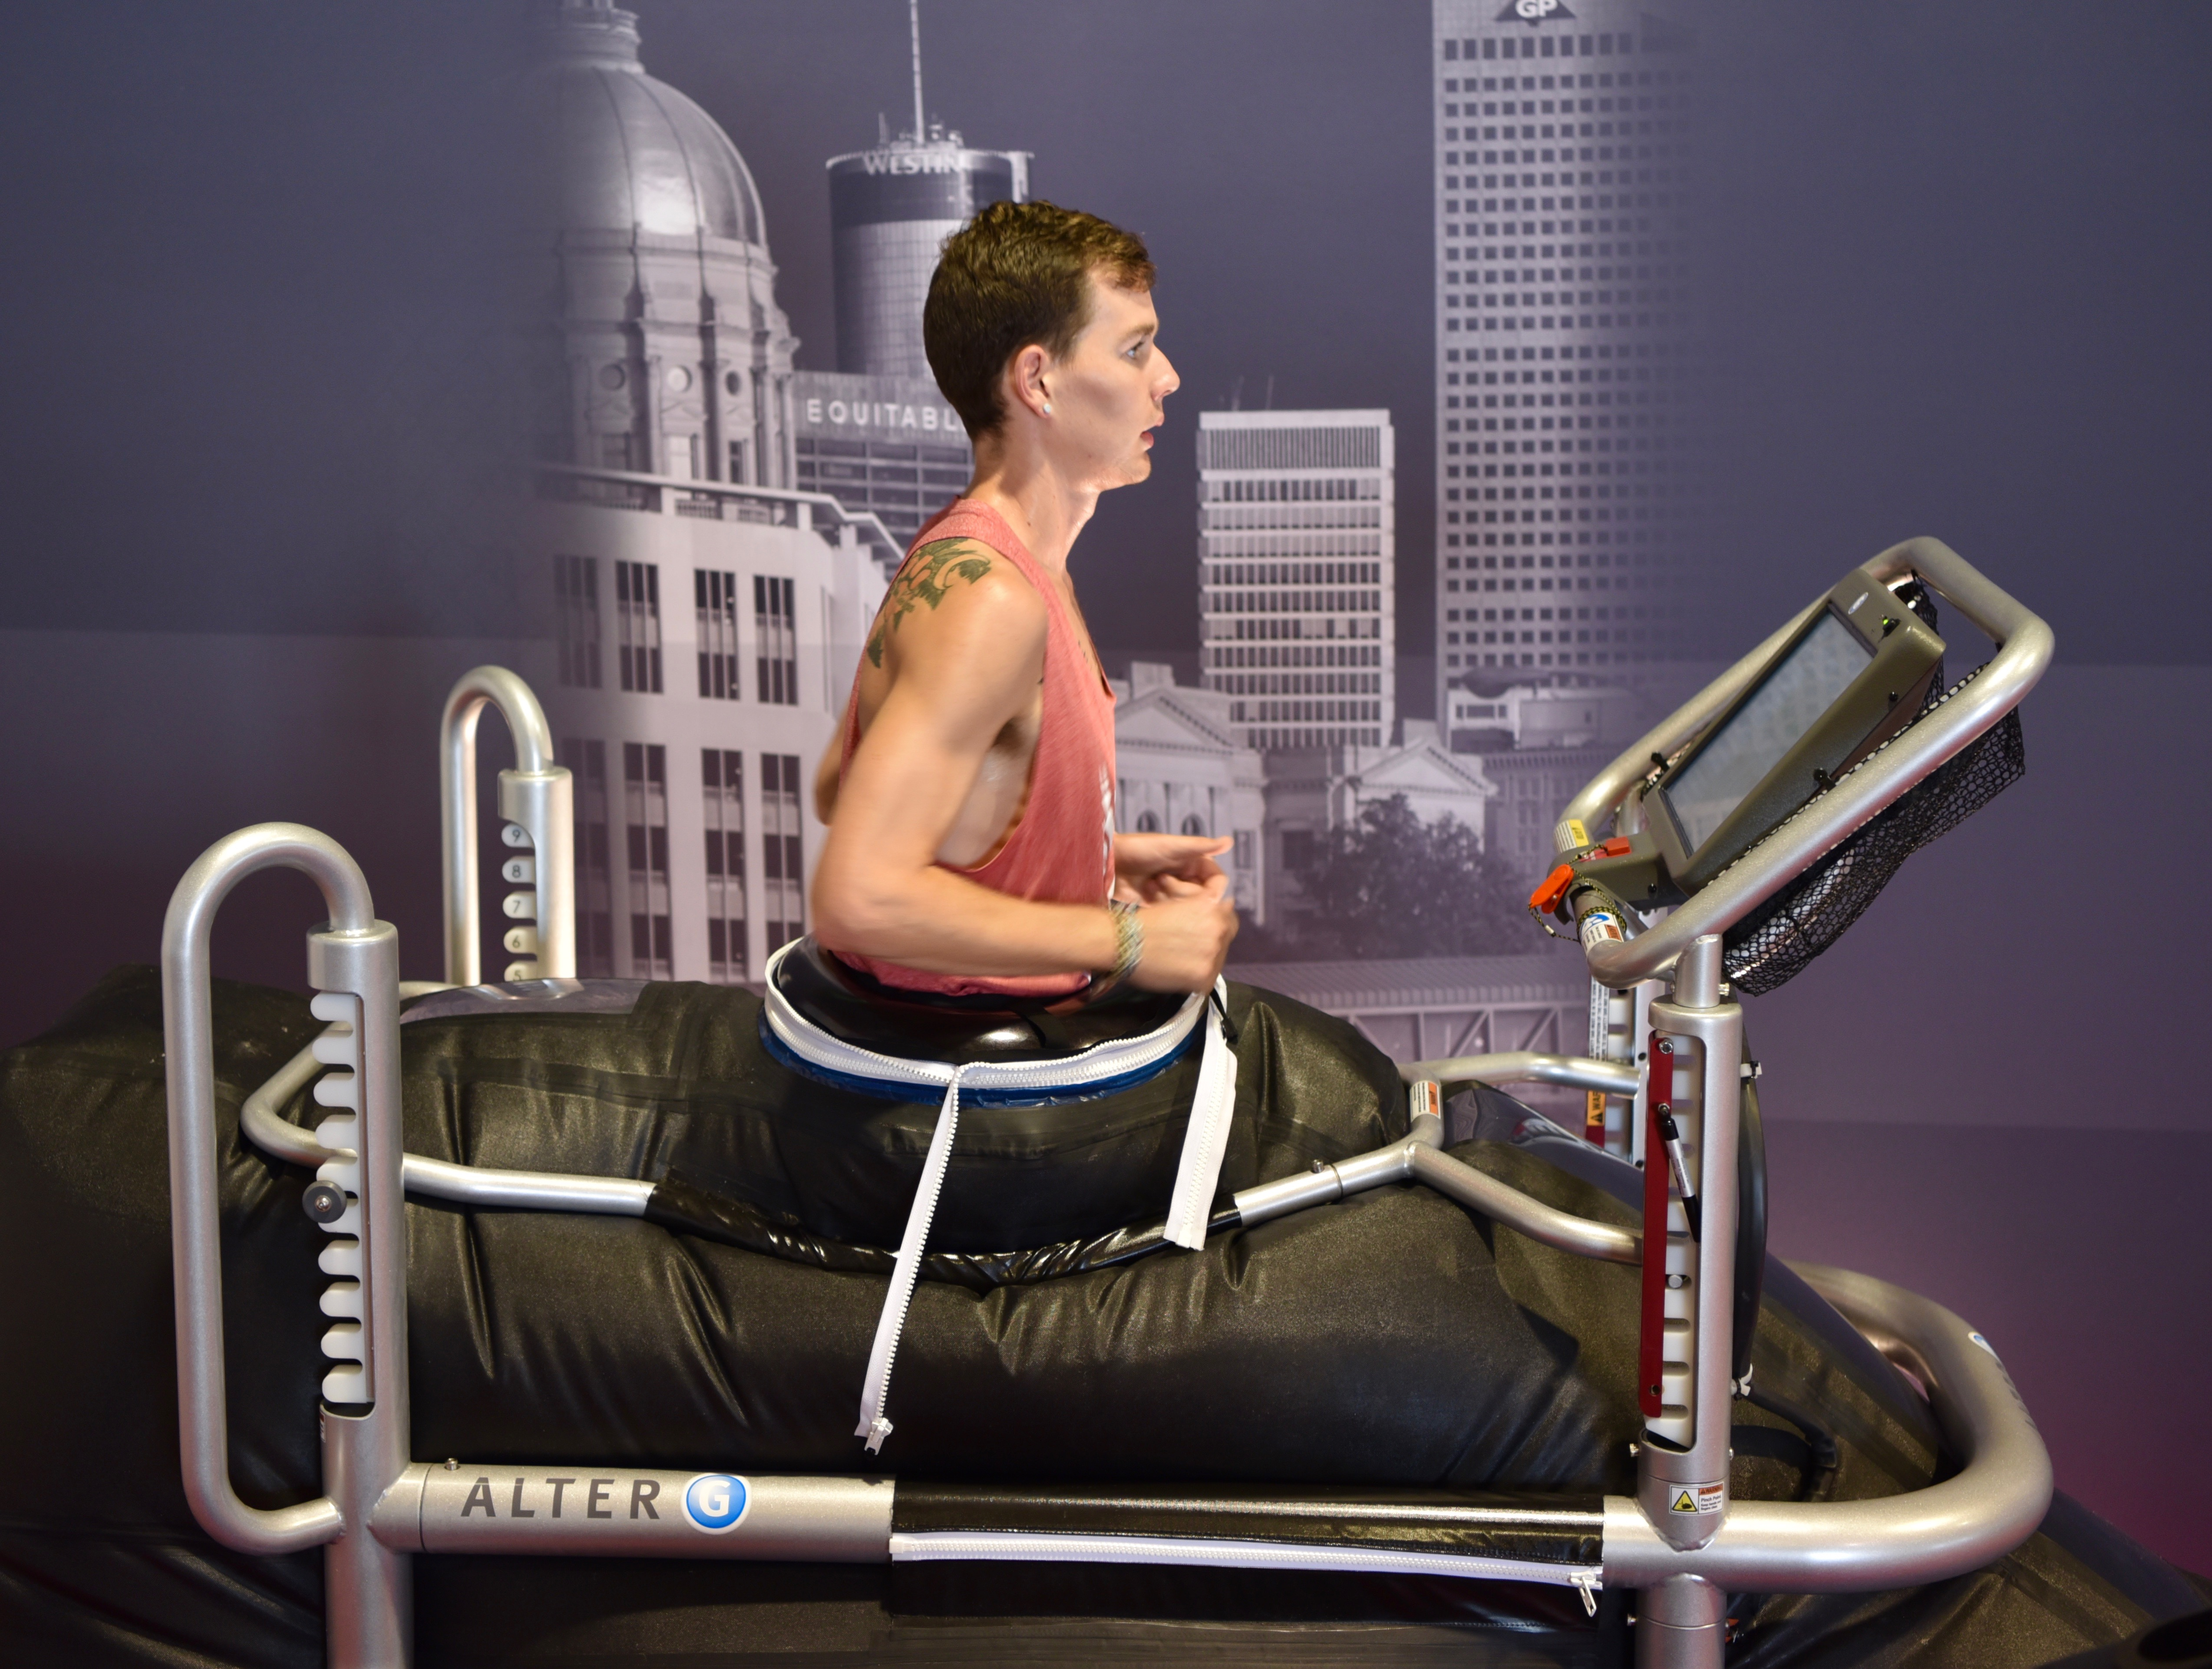 Atlanta Track Club's Alter G Treadmill | Atlanta Track Club